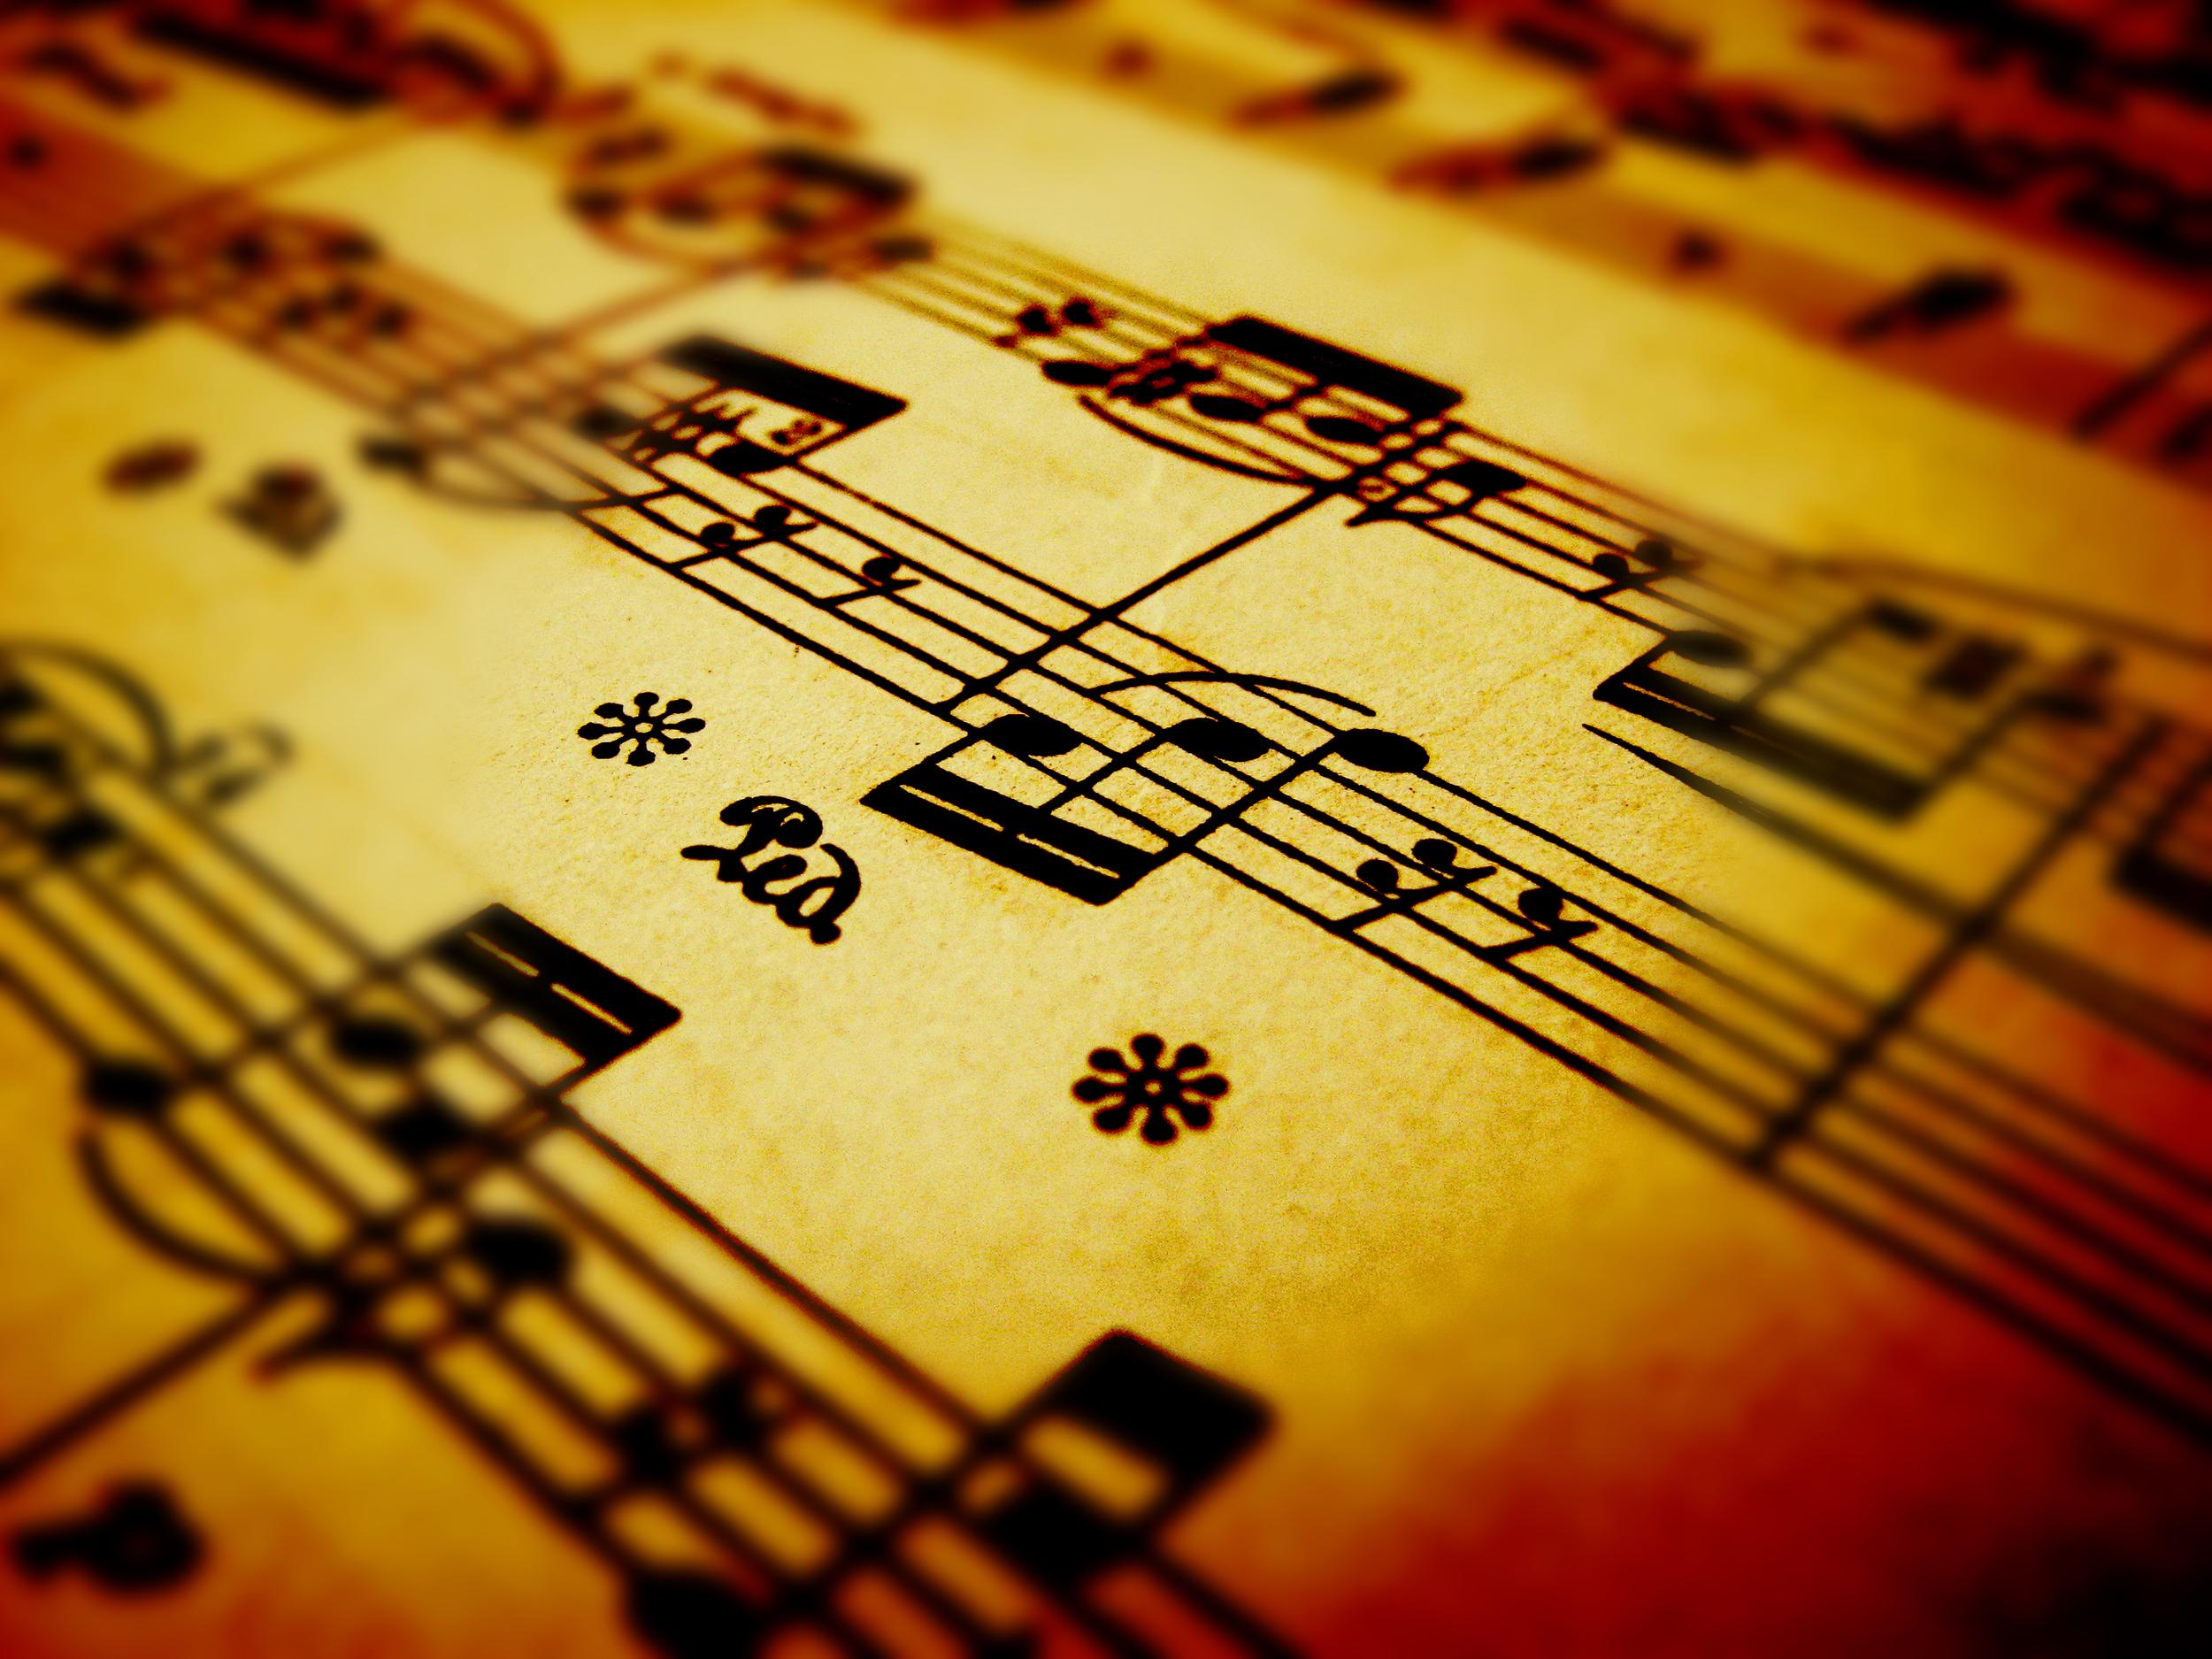 sheet-music-34